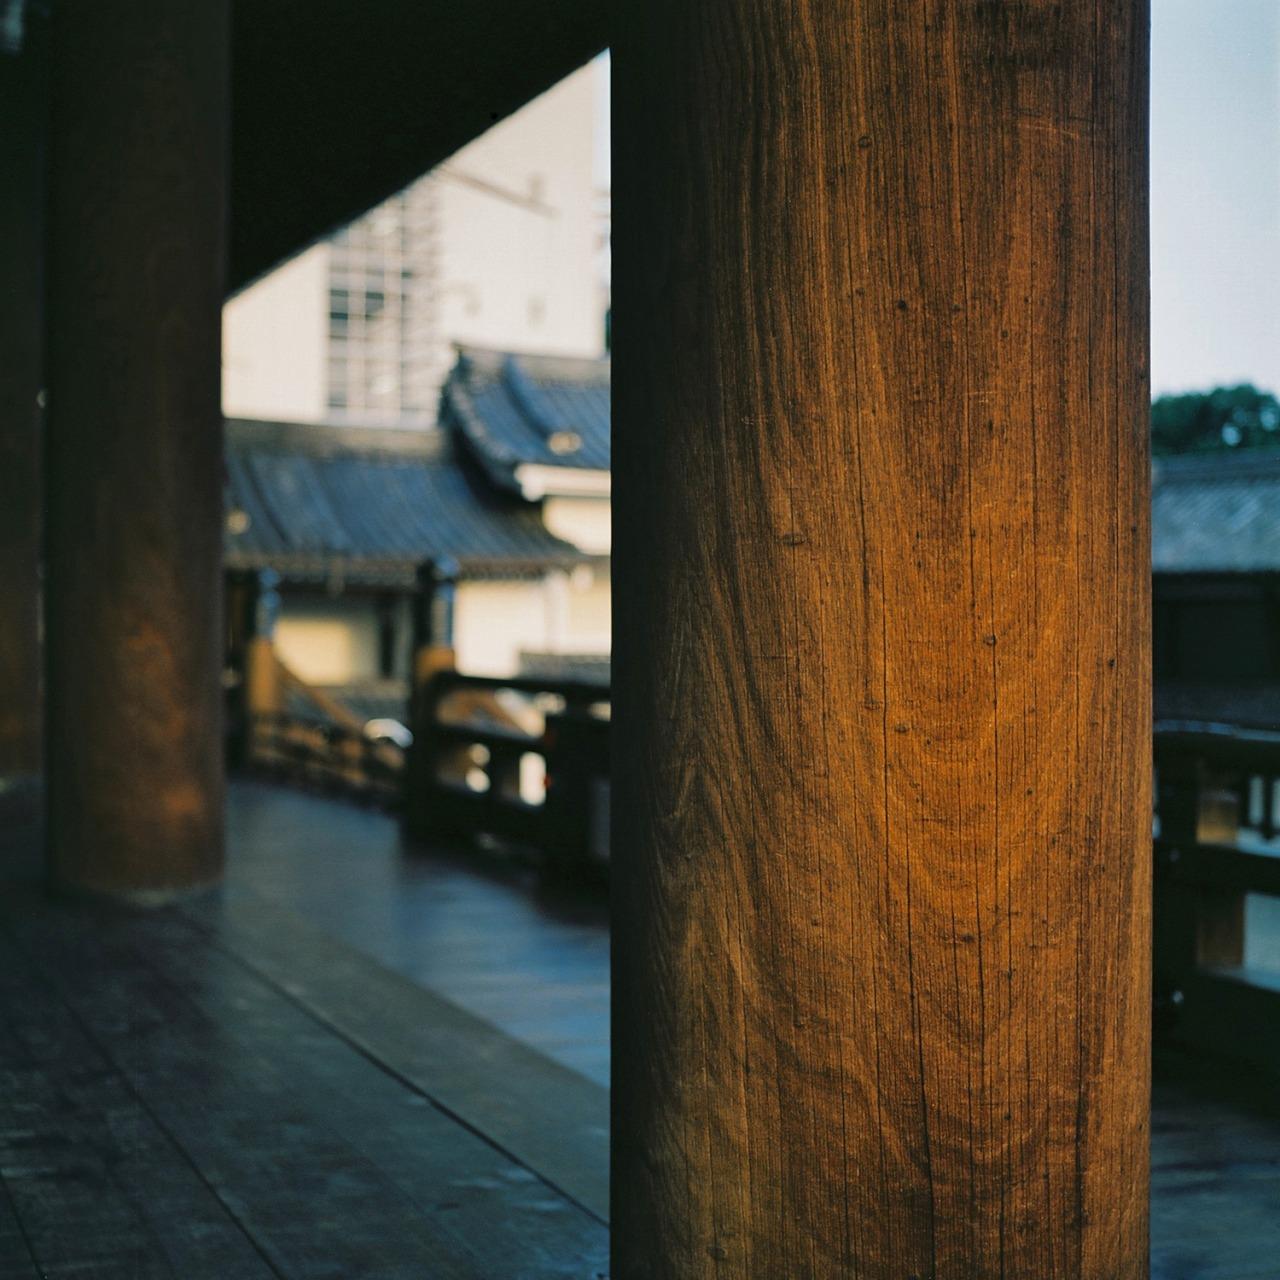 Founders Hall, Higashi Honganji, Shimogyo-ku, Kyoto, Japan 2012